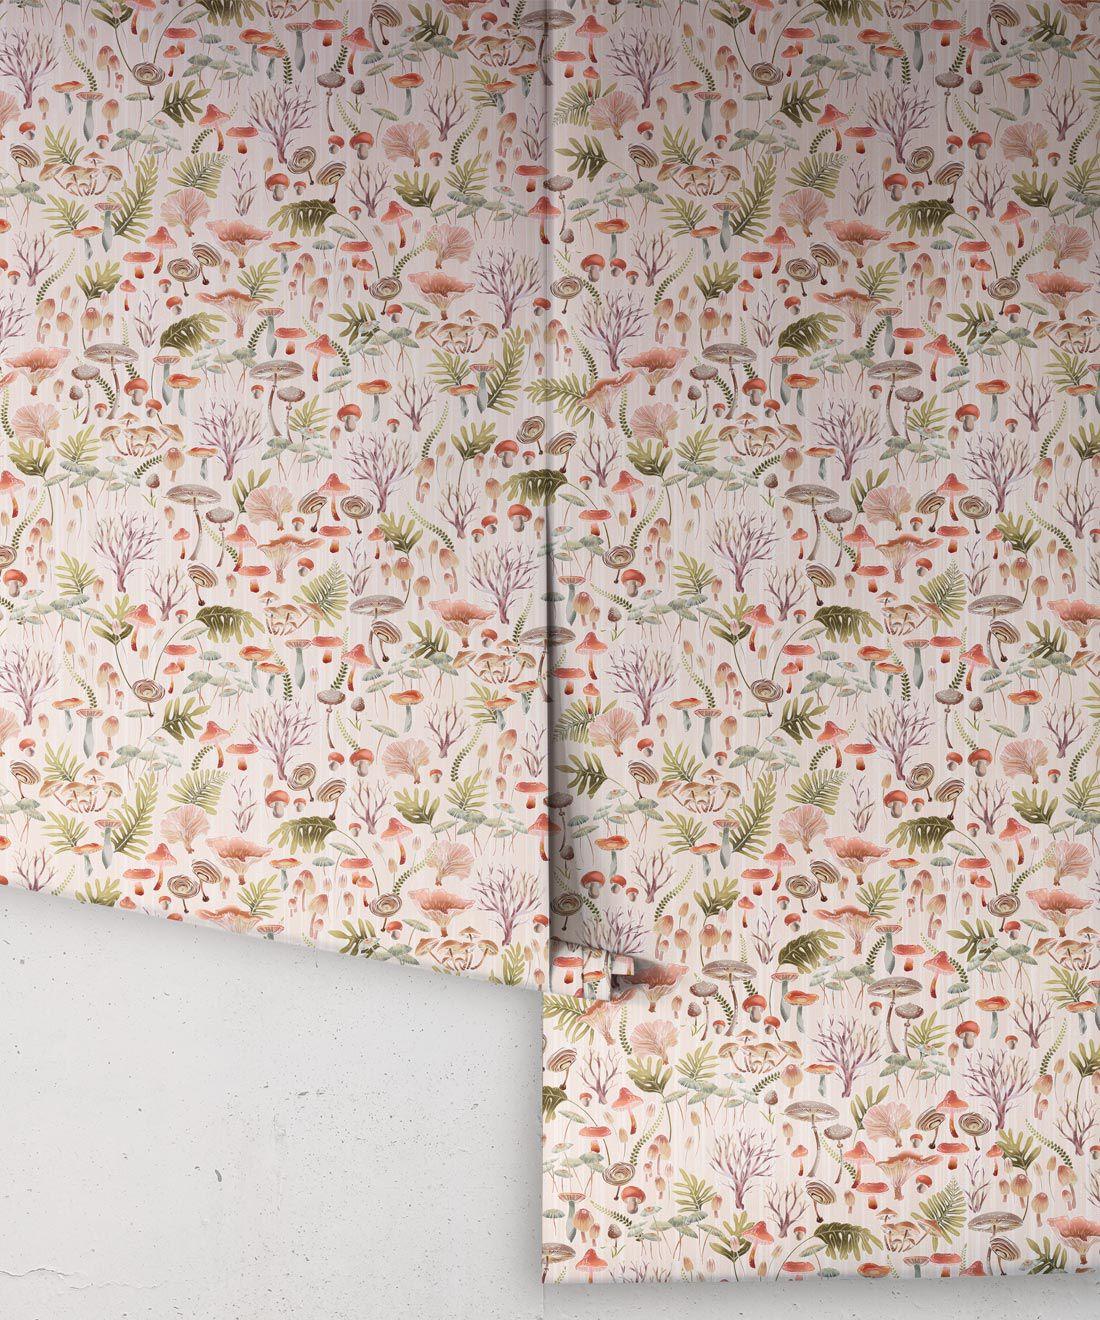 Fungi Wallpaper • Eloise Short • Vintage Floral Wallpaper •Granny Chic Wallpaper • Grandmillennial Style Wallpaper •Latte •Rolls